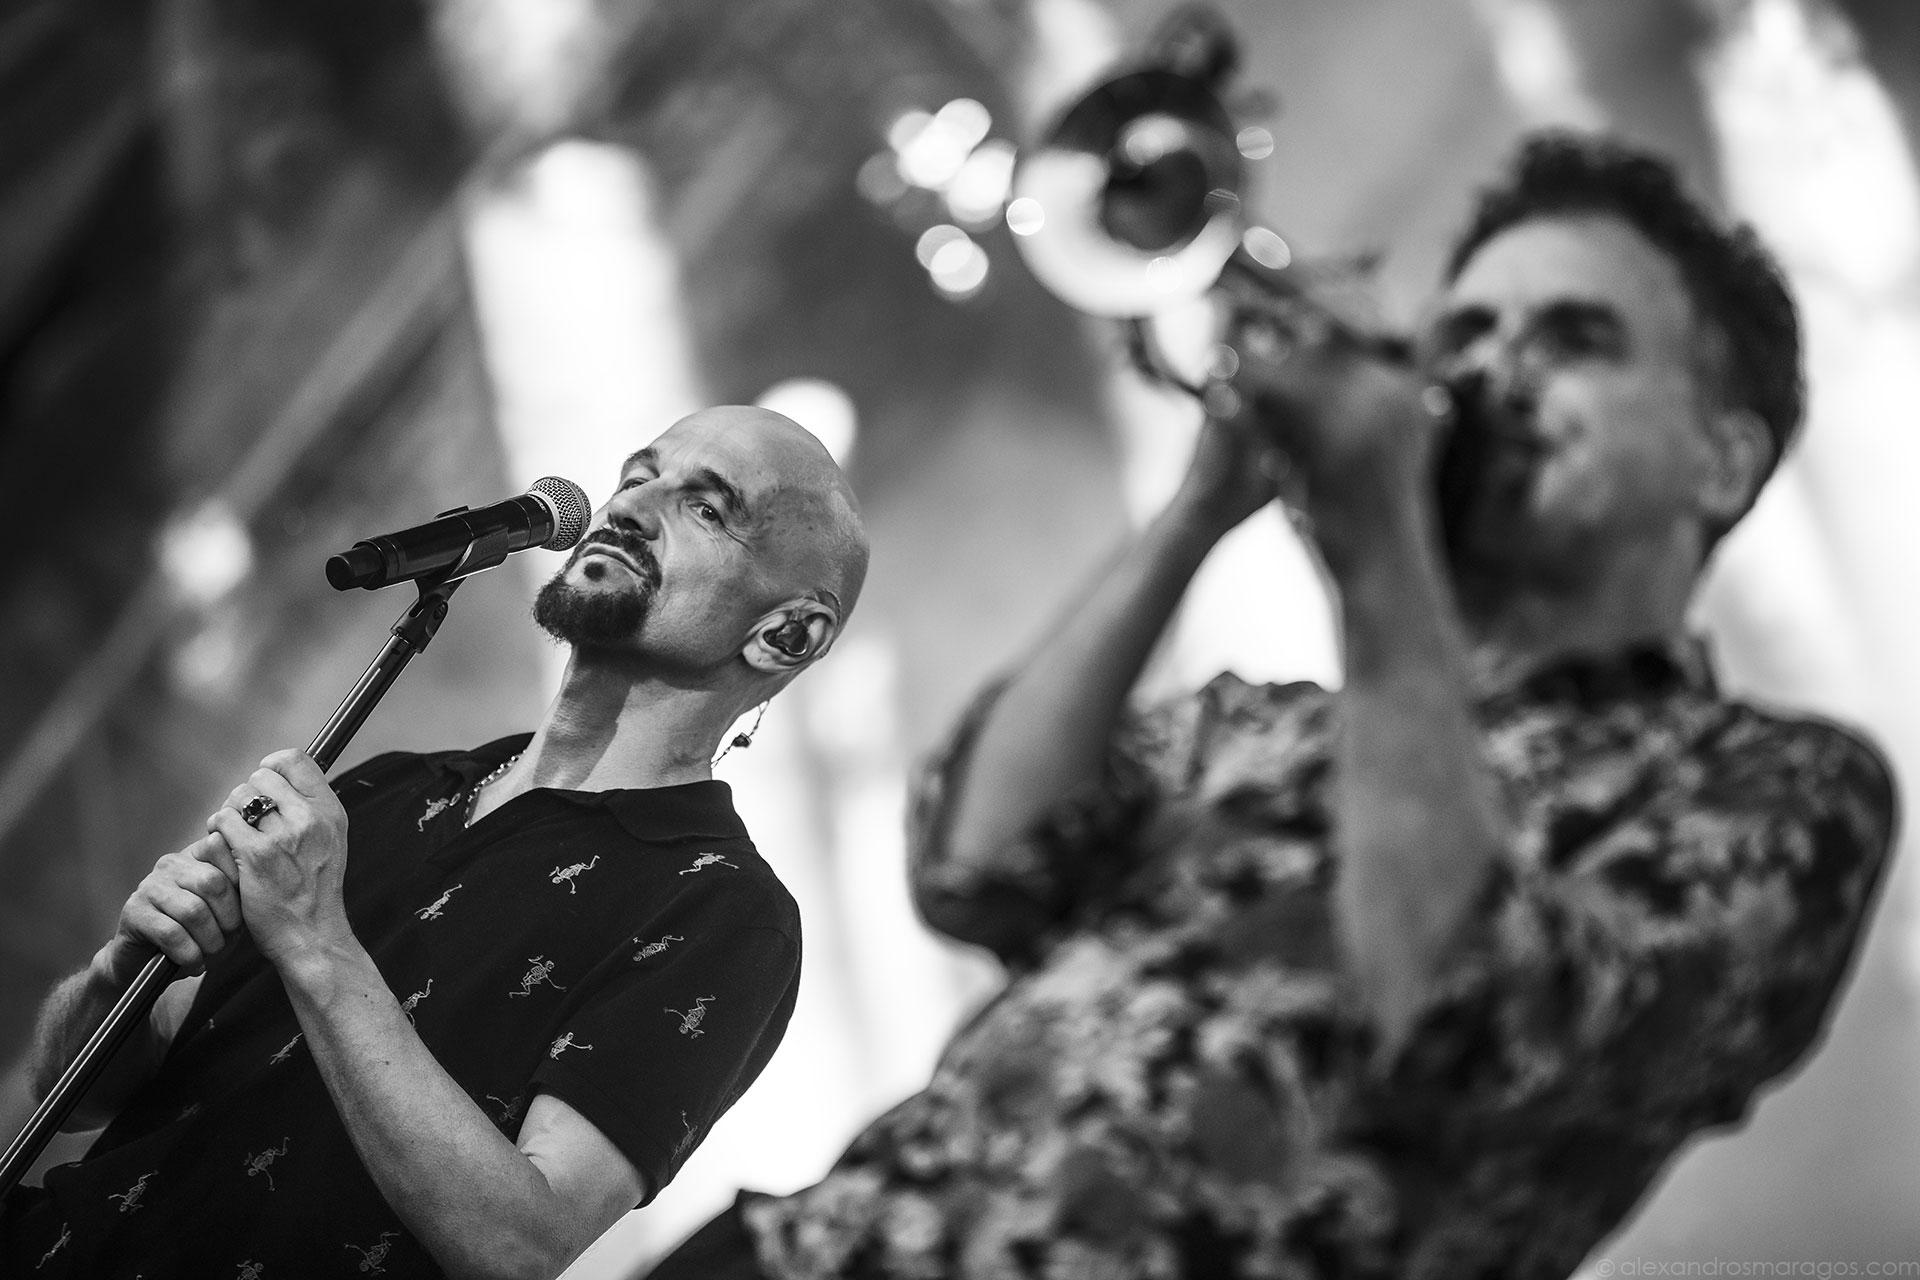 James - Release Athens 2019 | © Alexandros Maragos